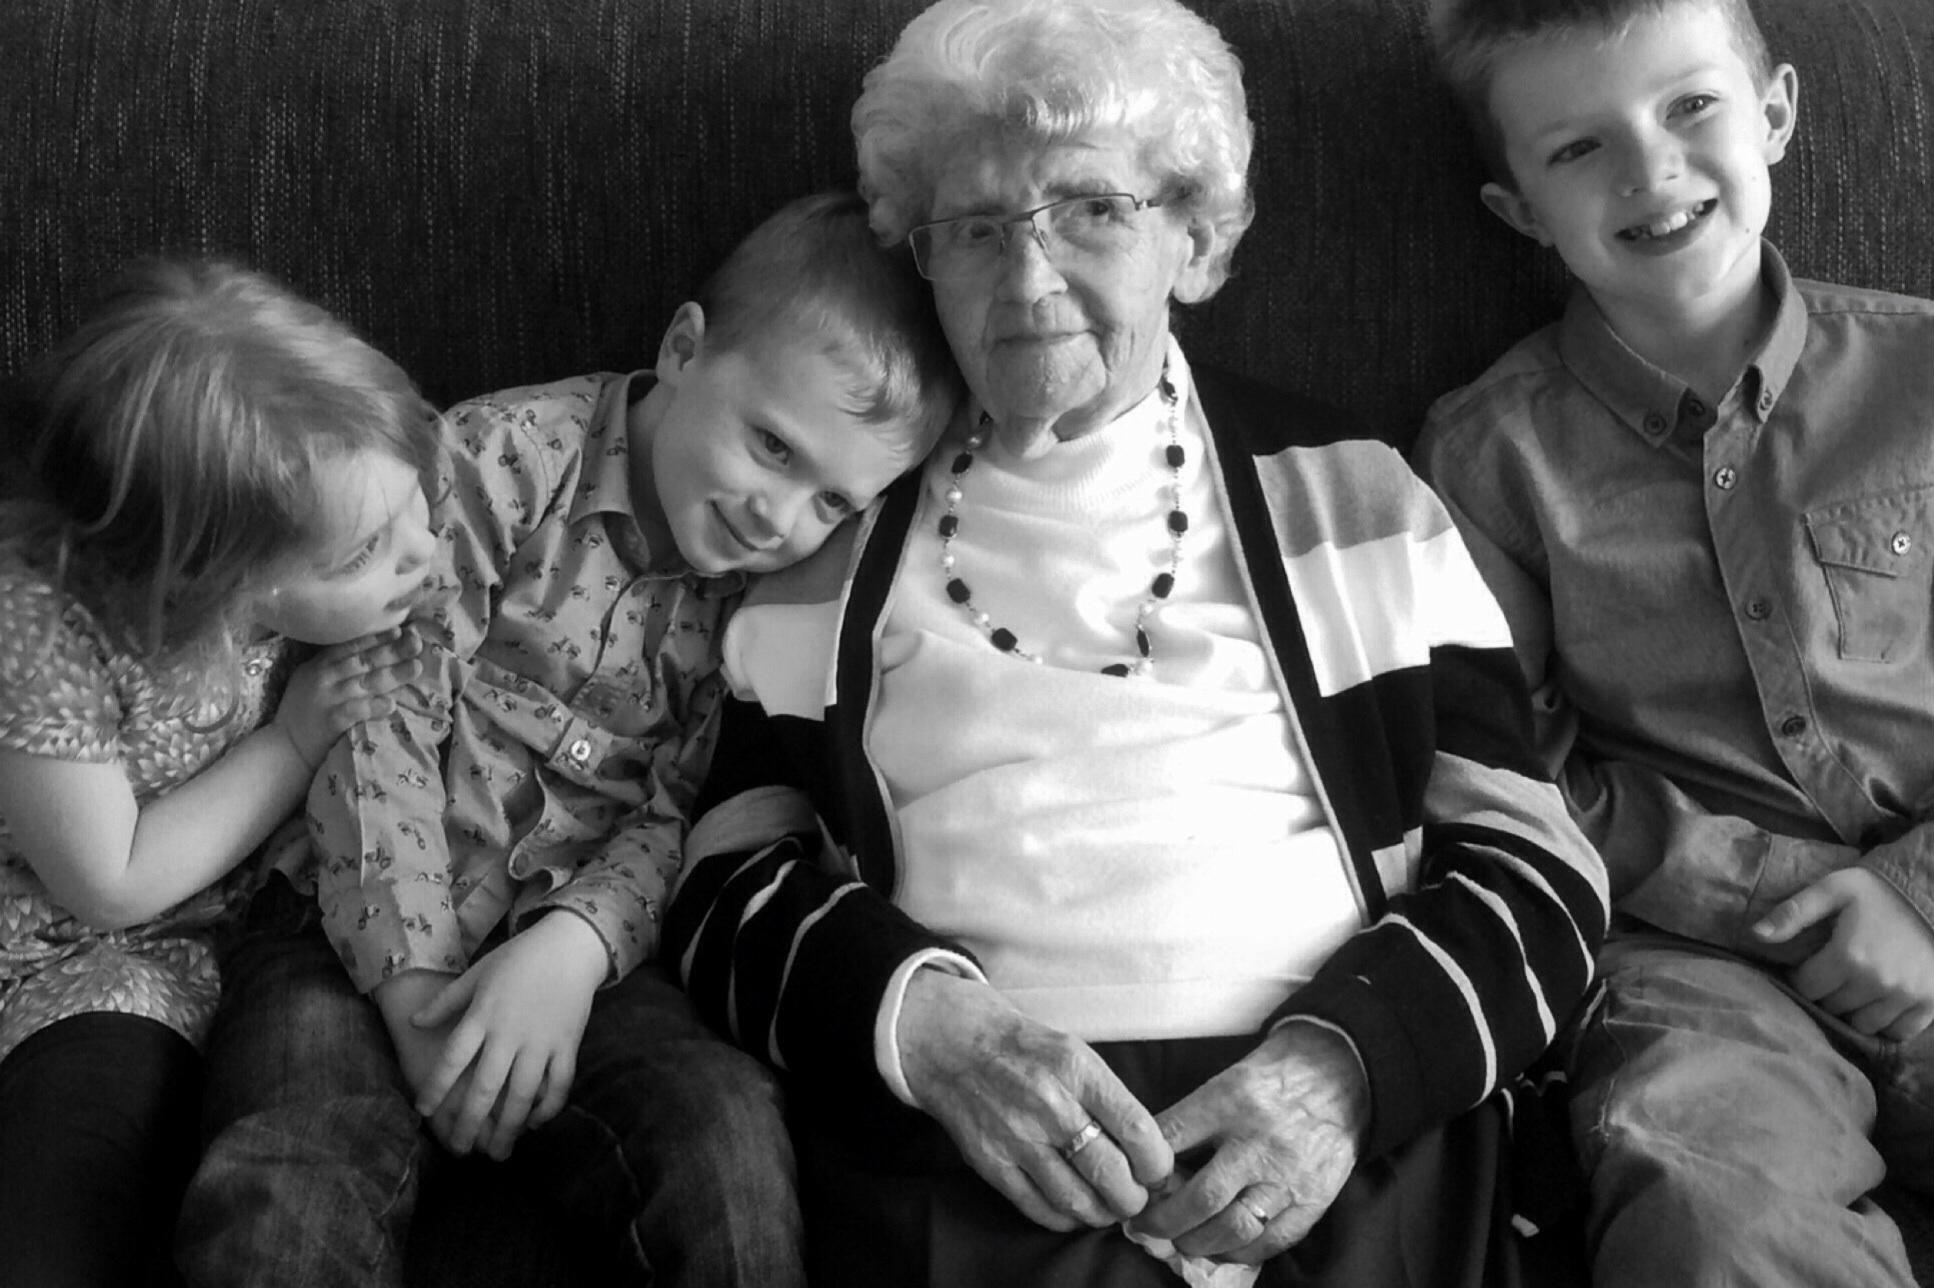 Childhood: Great Granny